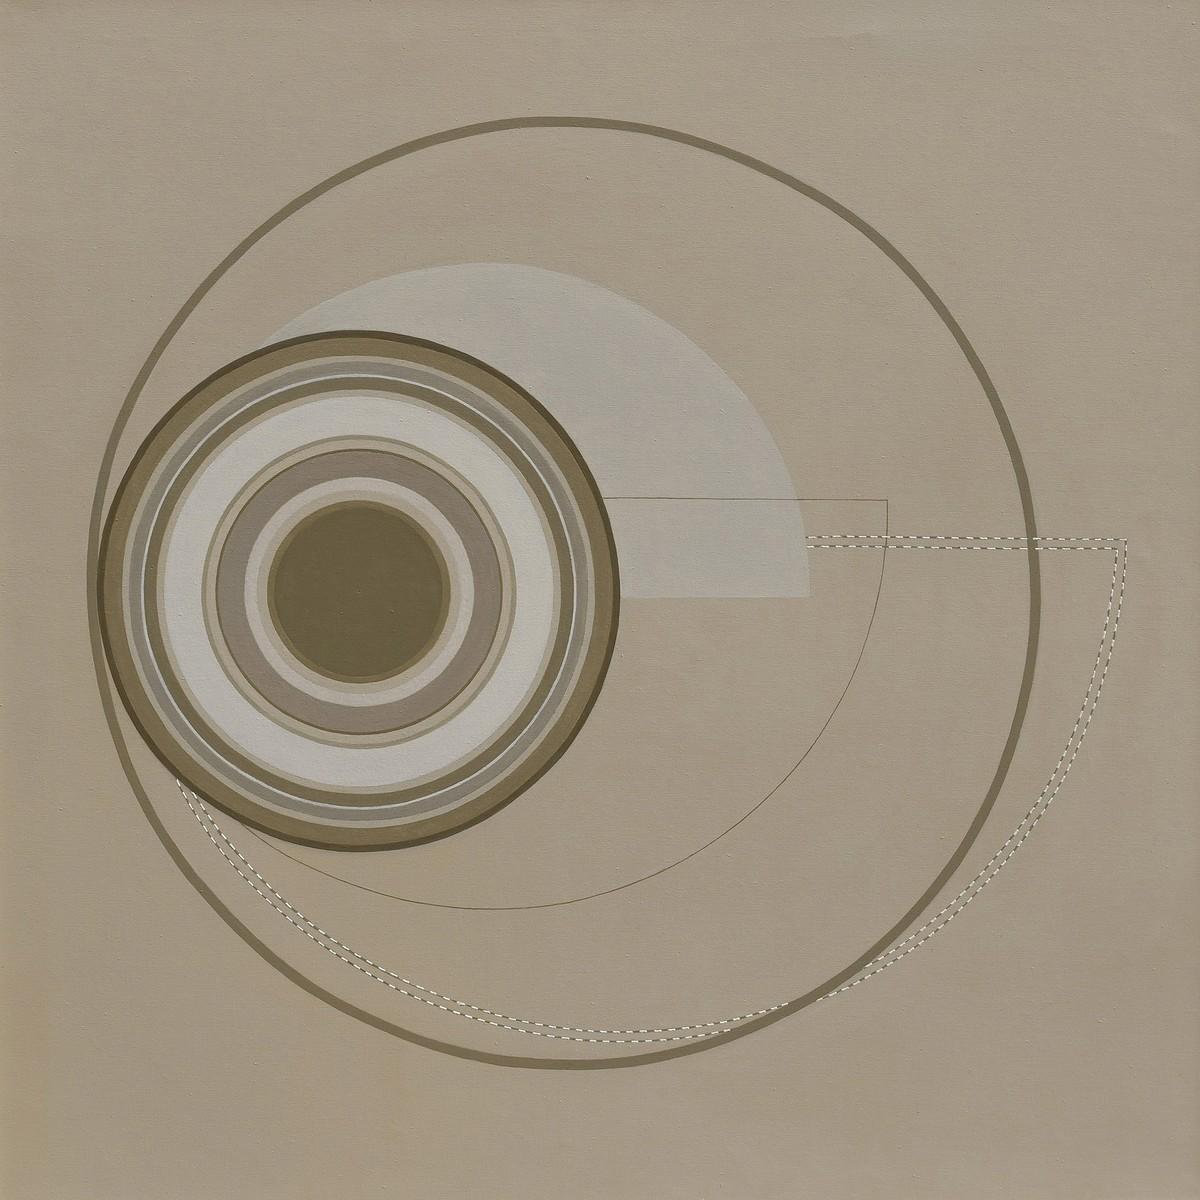 untitled by Dhruti Mahajan, Geometrical Painting, Acrylic on Canvas, Zorba color